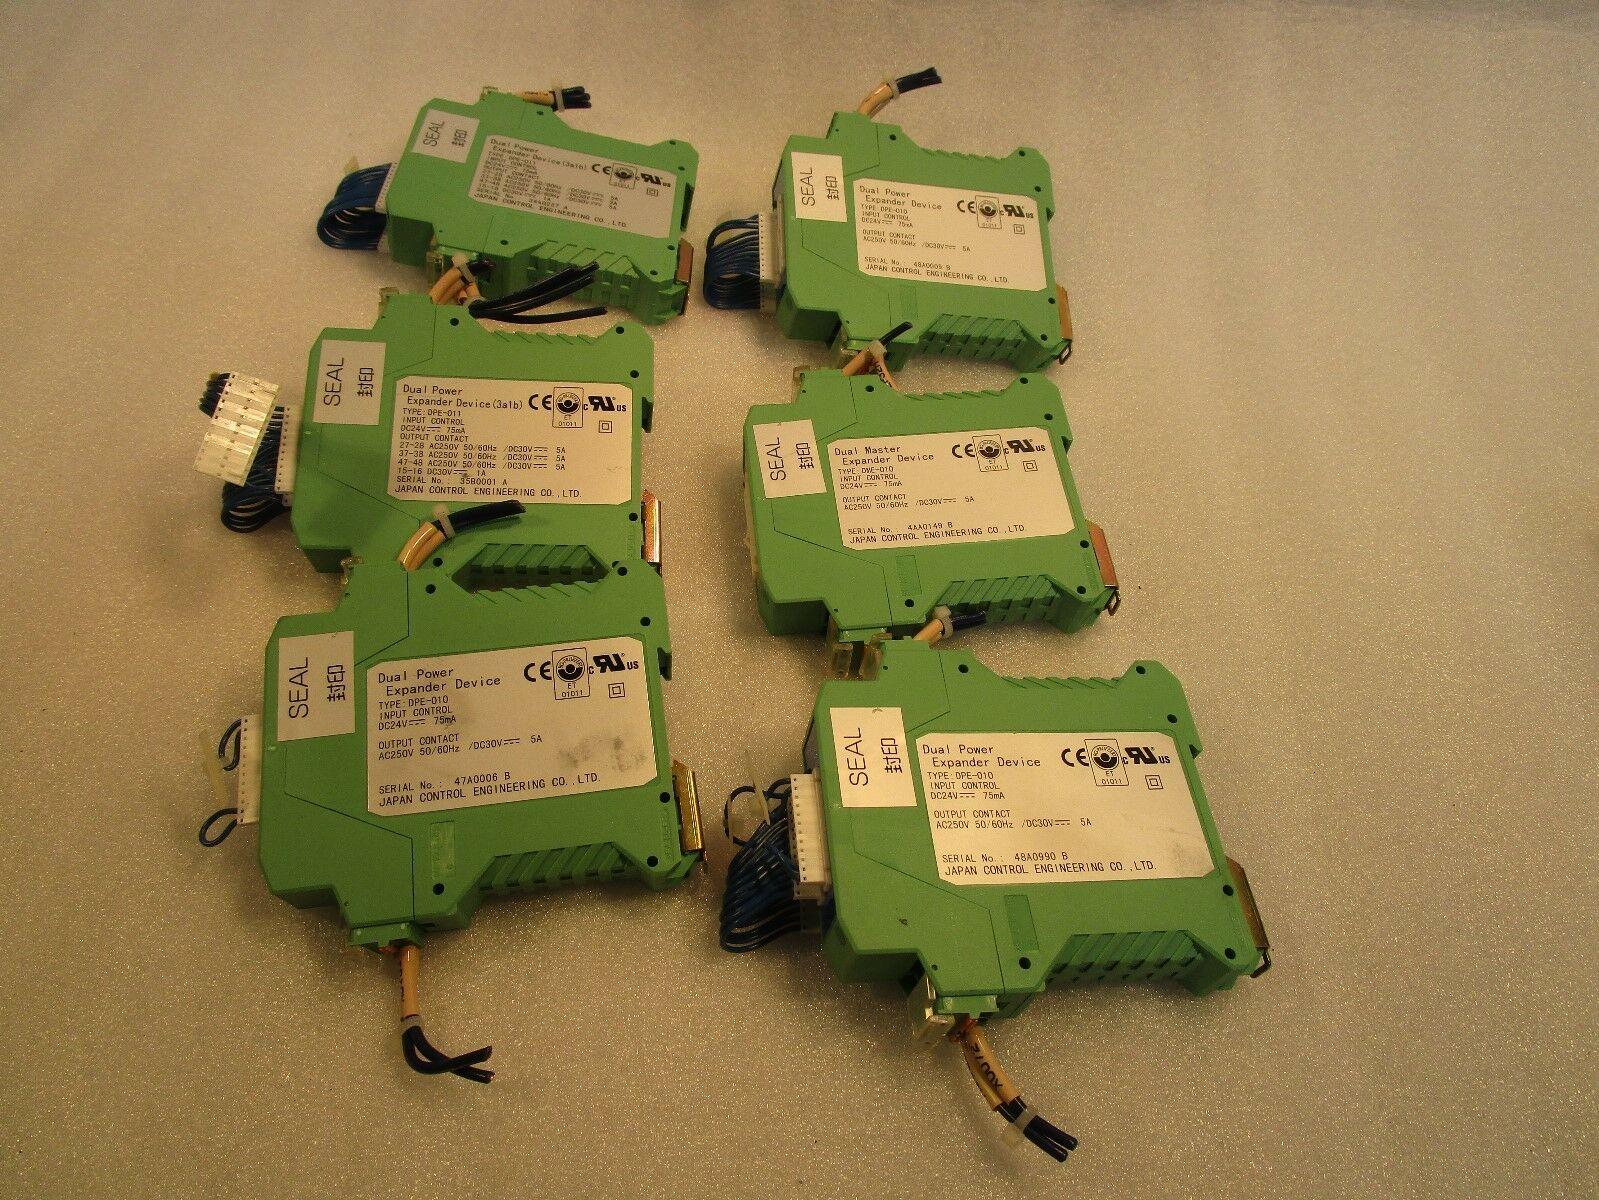 JSK Co Japan Control Engineering JCE DPE-011 Dual Power Expander Device (3a1b)